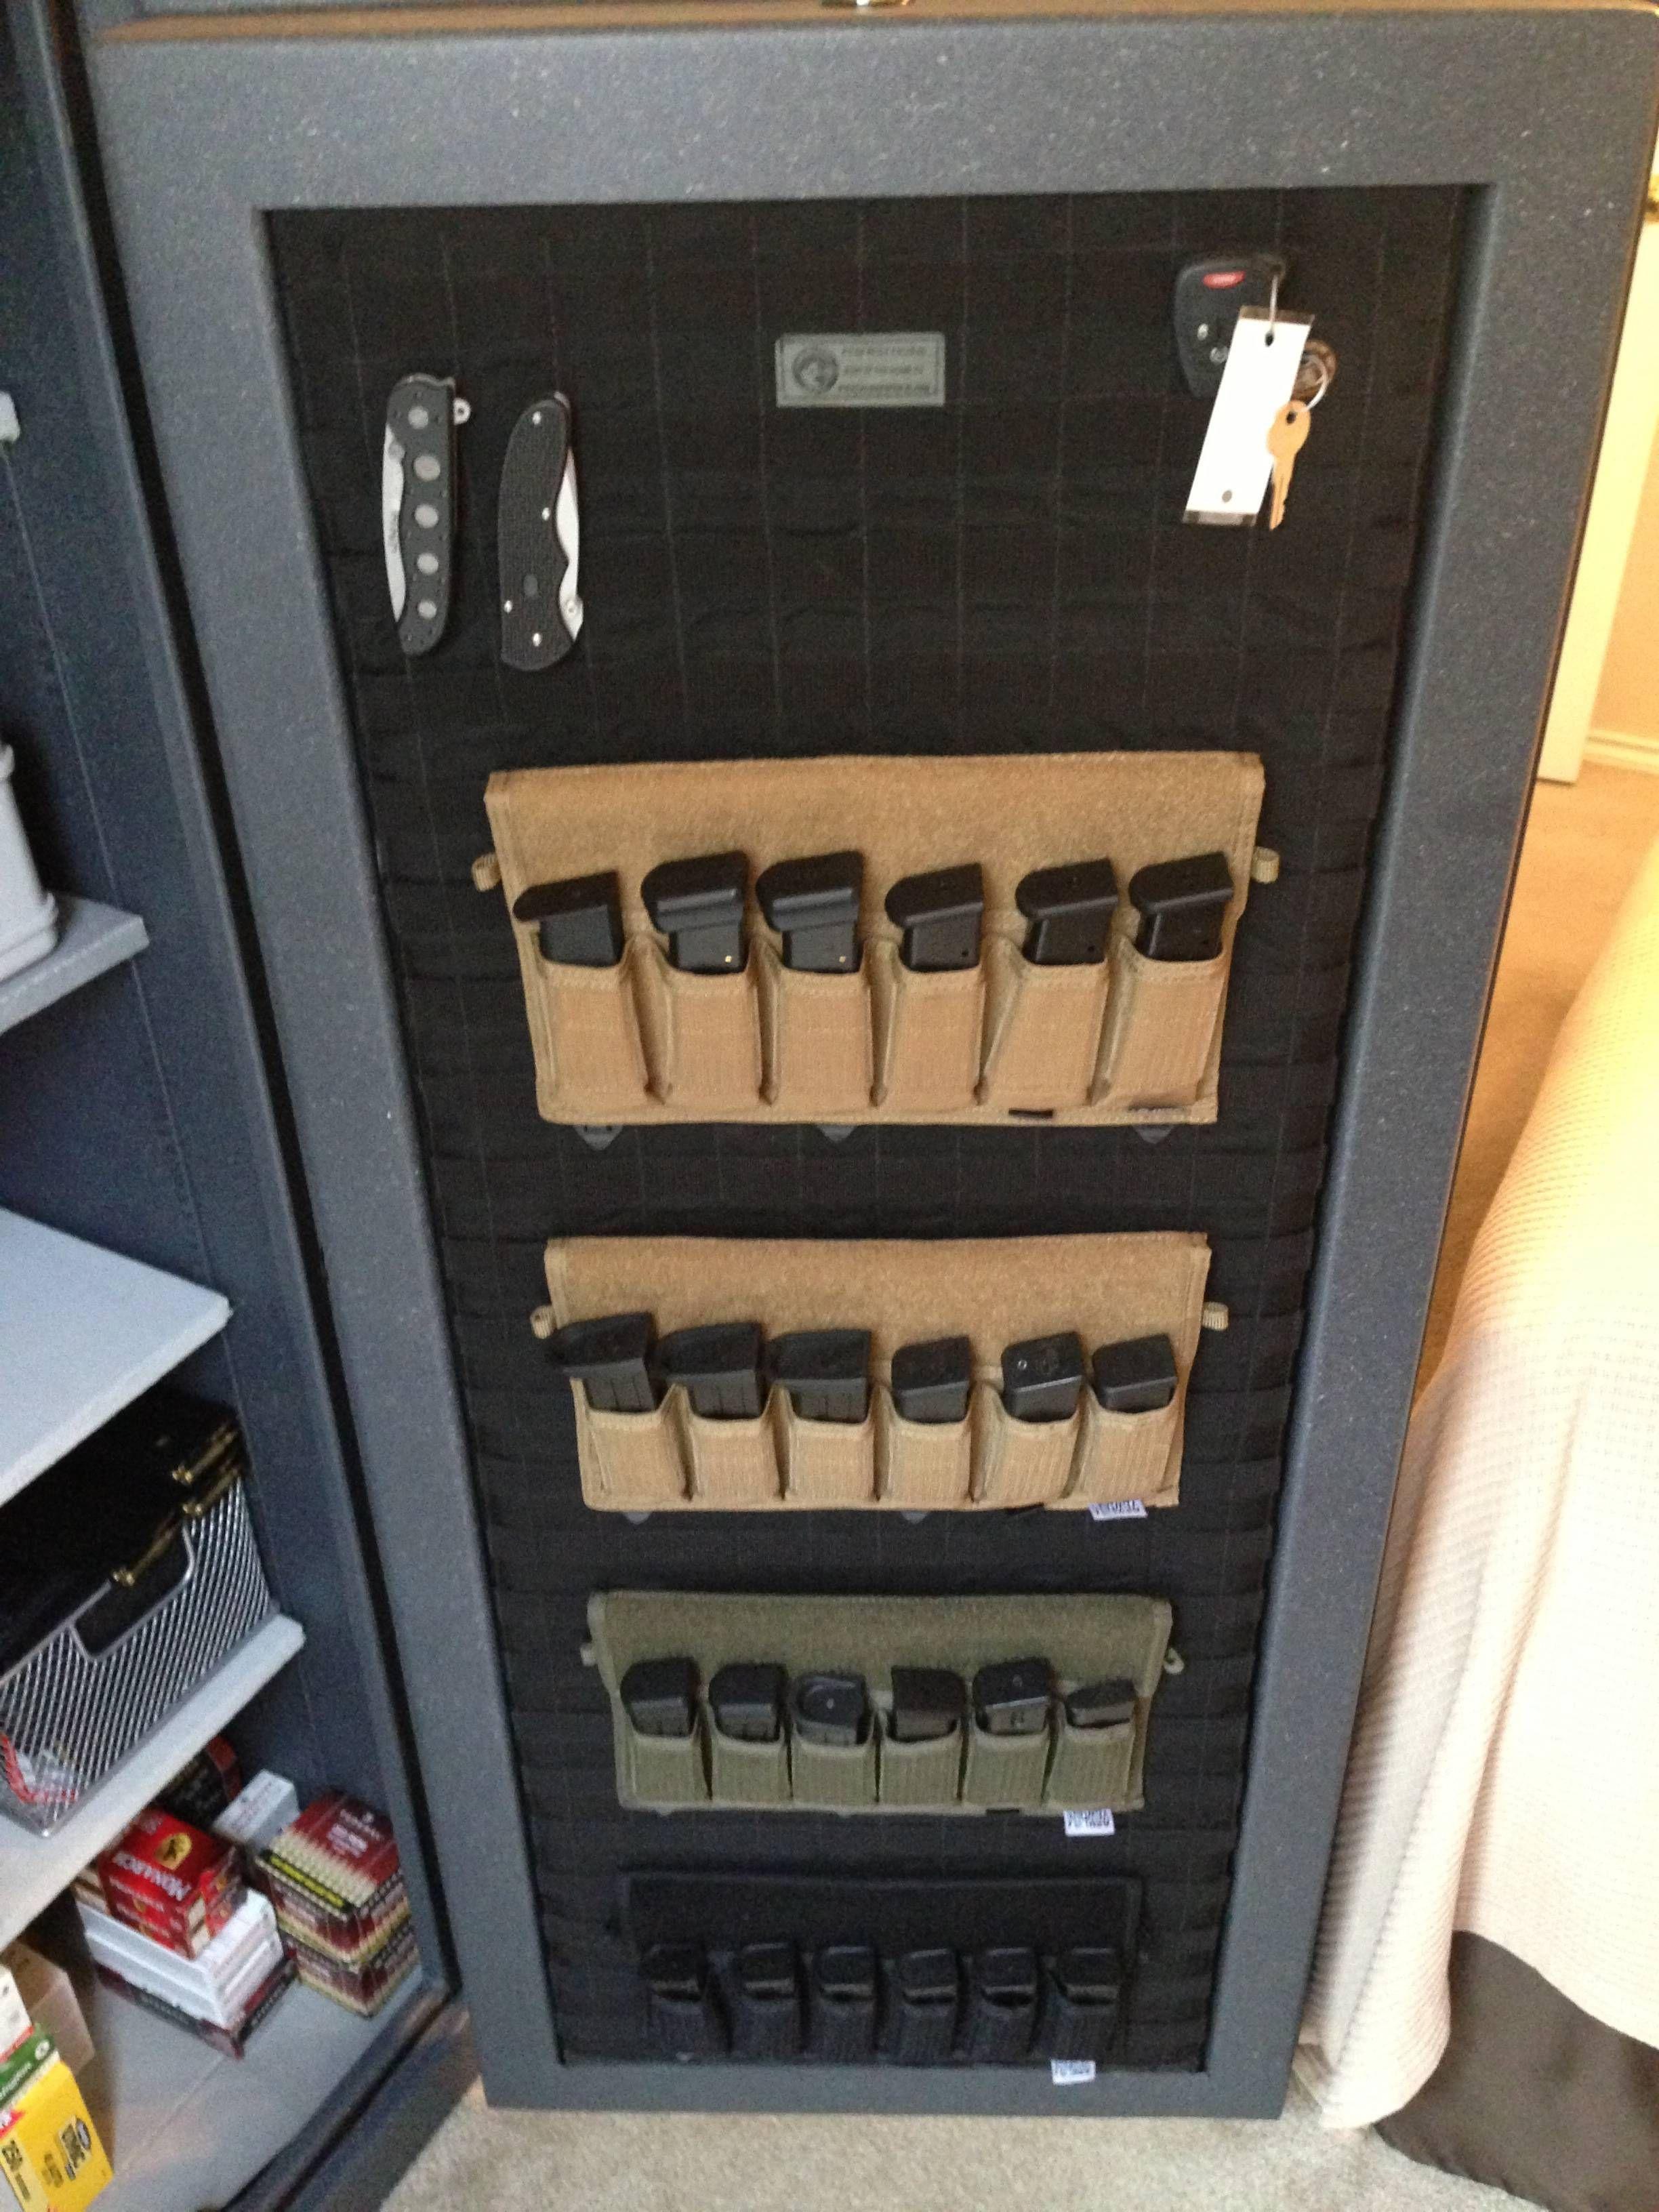 doors gun door ts on product index at stack safes safe guide s sportsman organizer